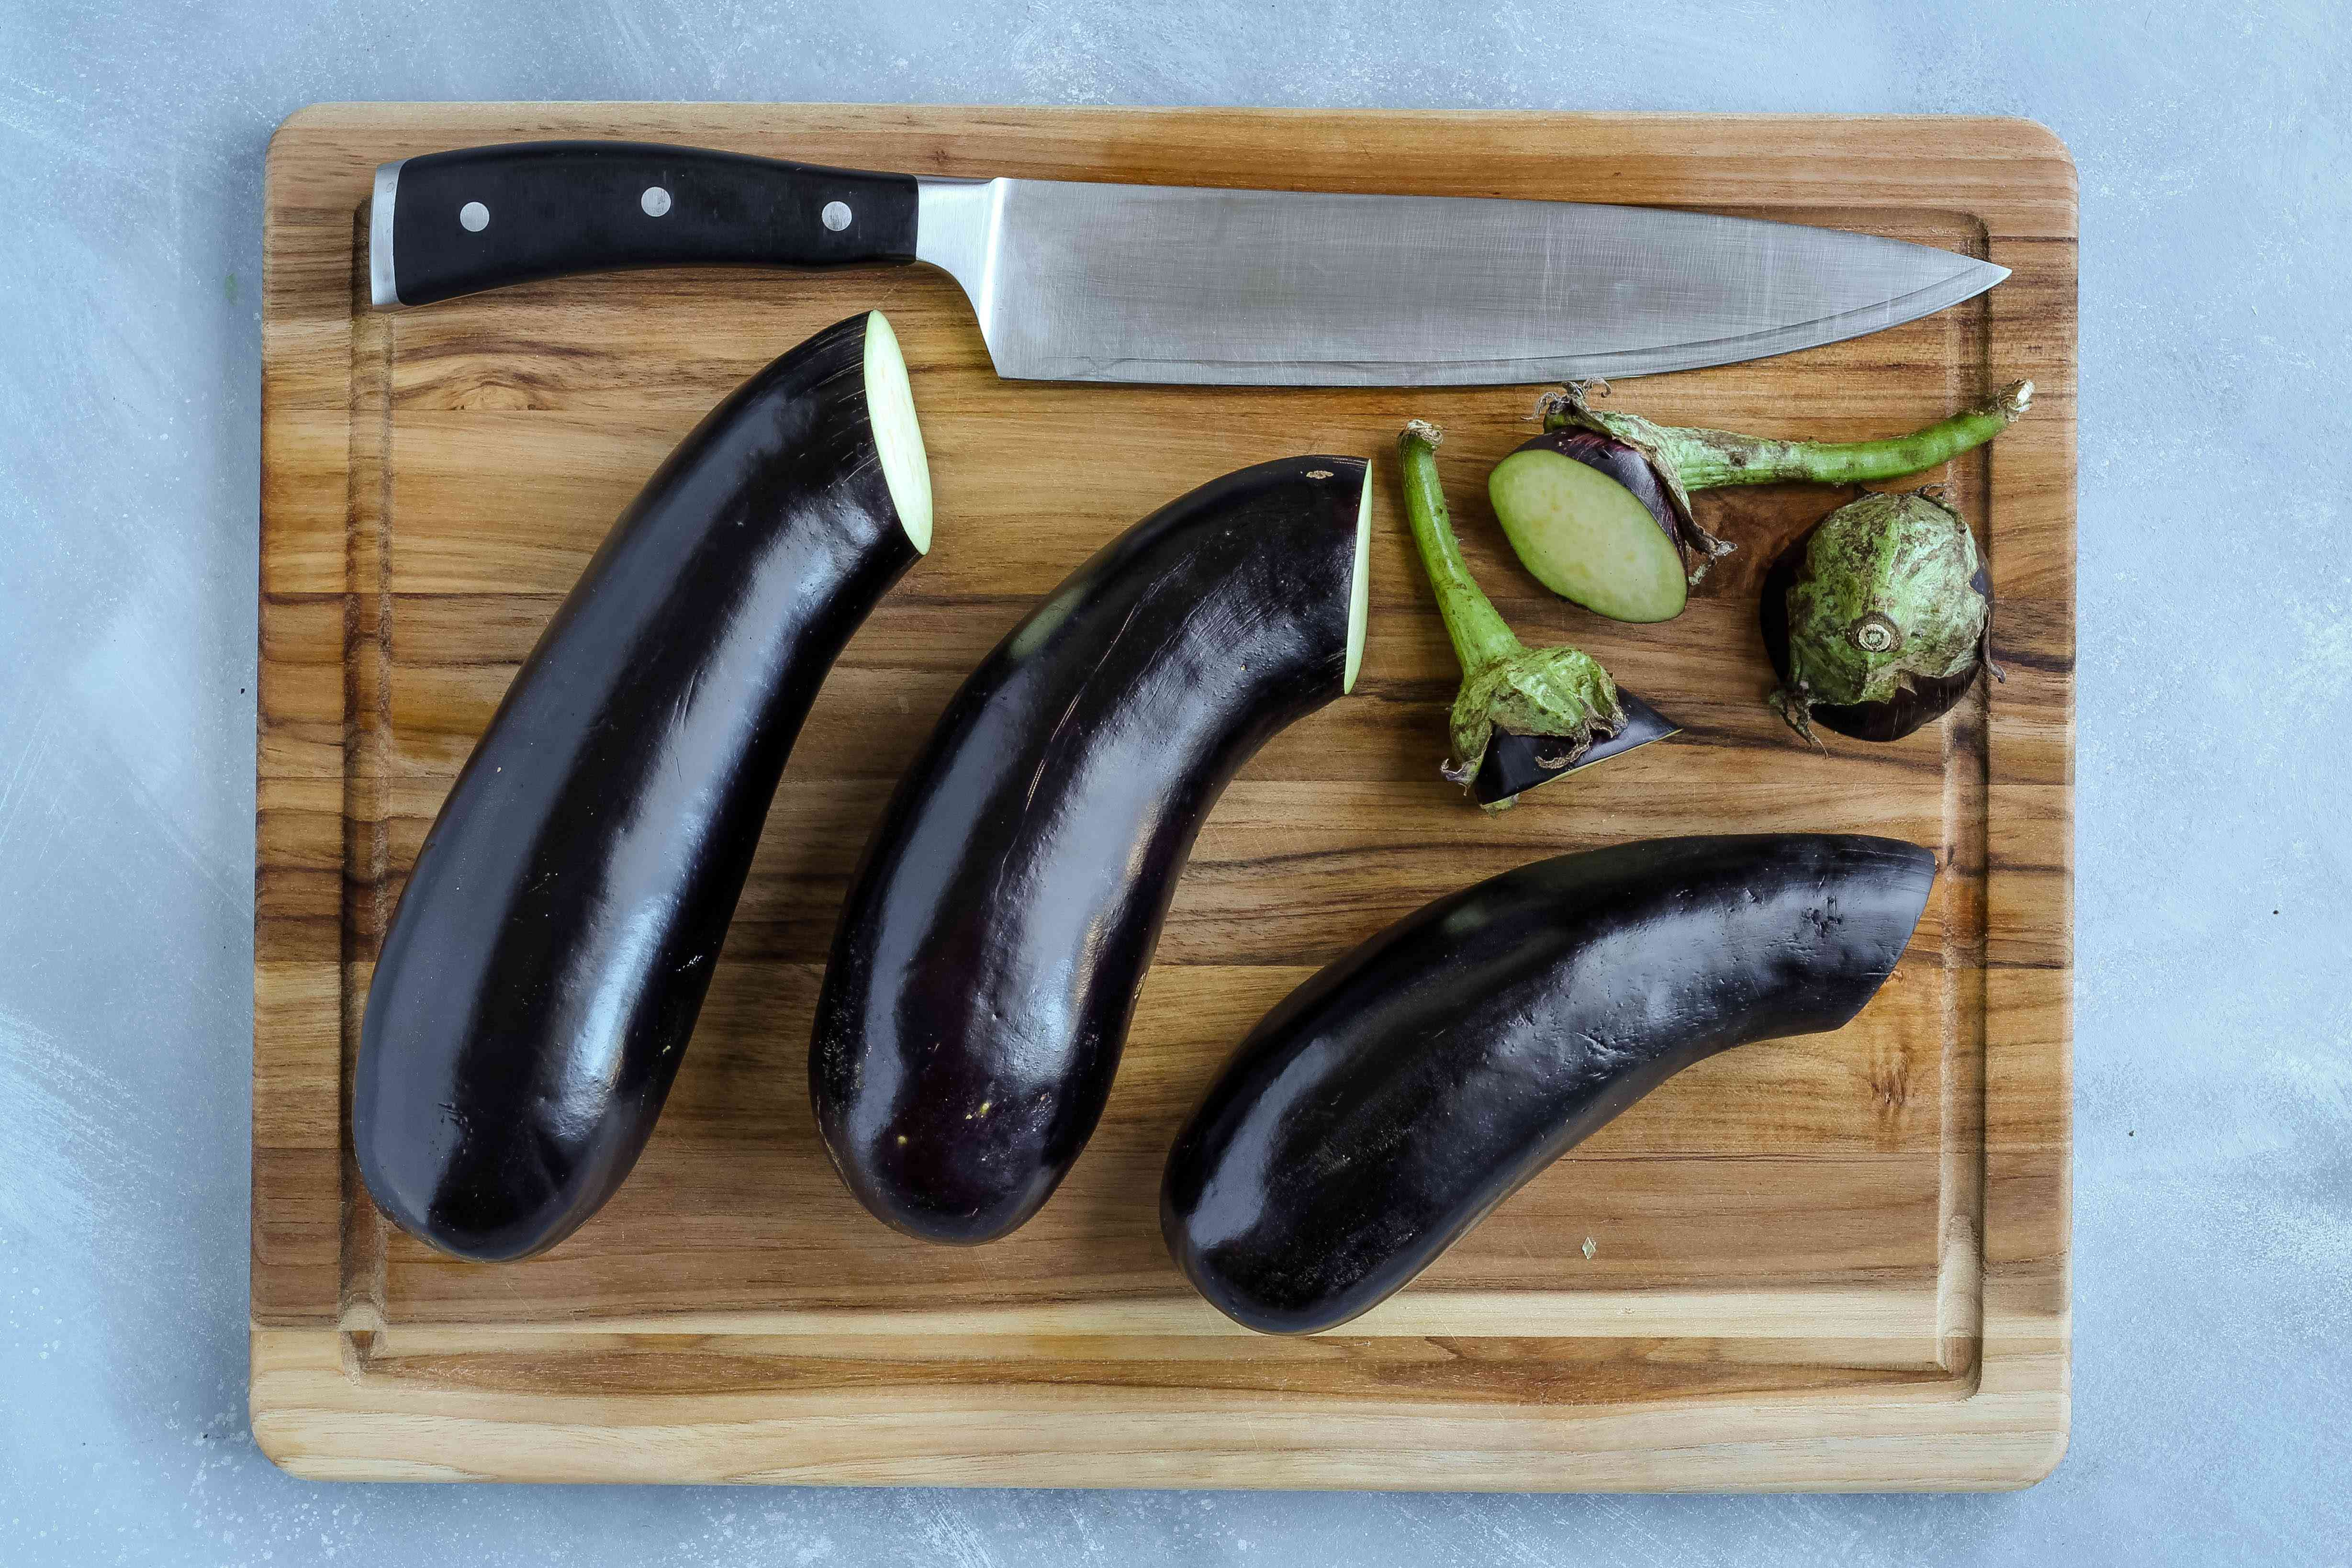 Stem ends trimmed off the eggplant